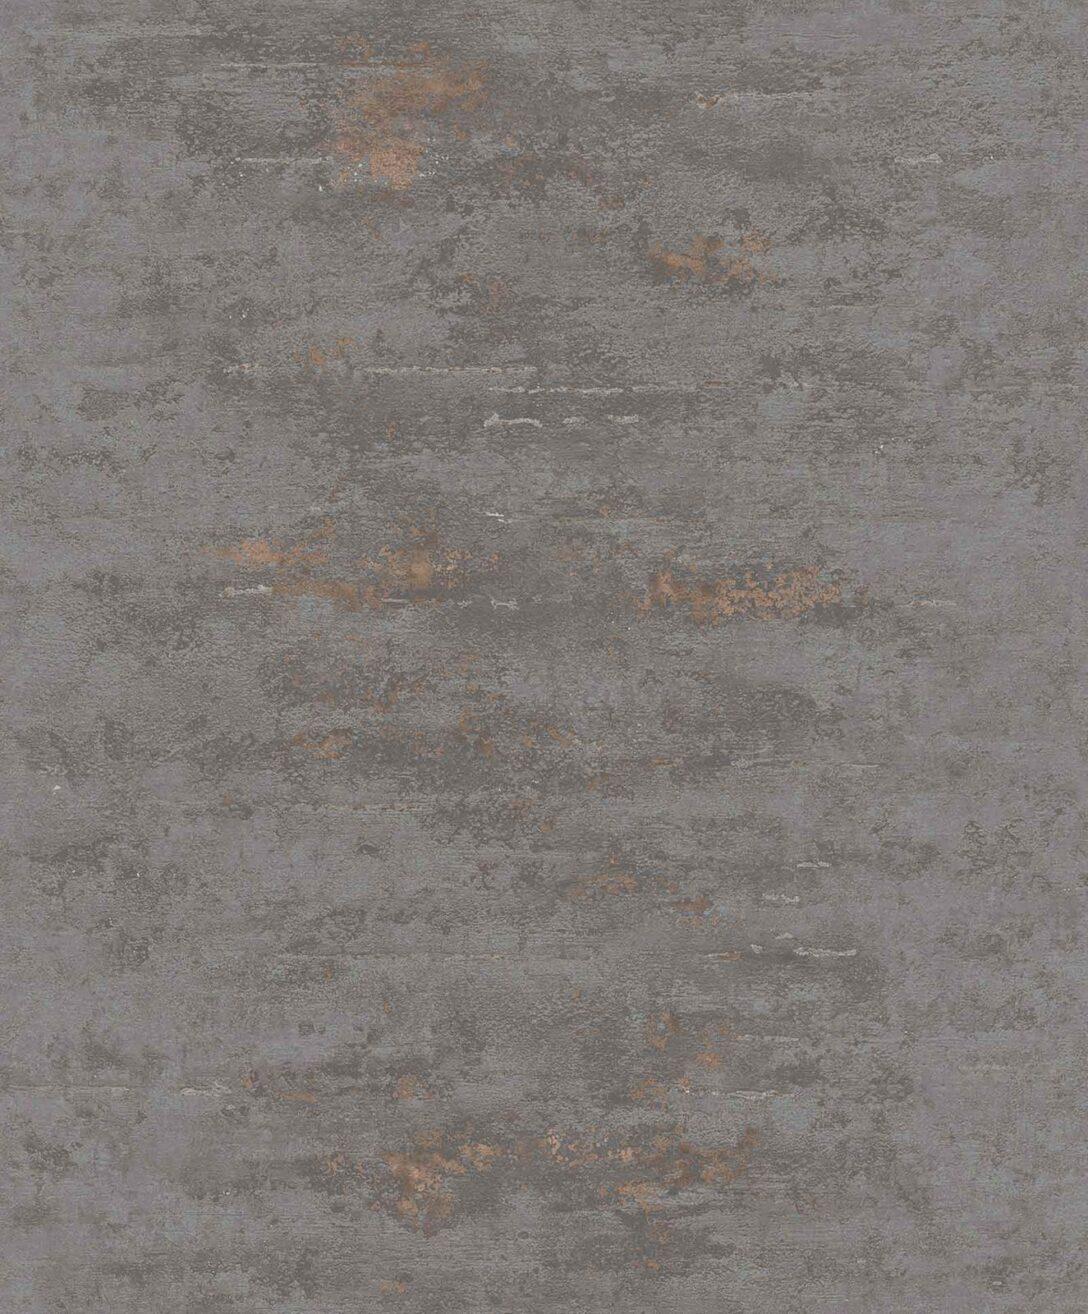 Large Size of Tapete Betonoptik Vlies Beton Used Dunkelgrau Kupfer Metallic On4201 Tapeten Schlafzimmer Bad Küche Fototapeten Wohnzimmer Fototapete Fenster Für Die Modern Wohnzimmer Tapete Betonoptik